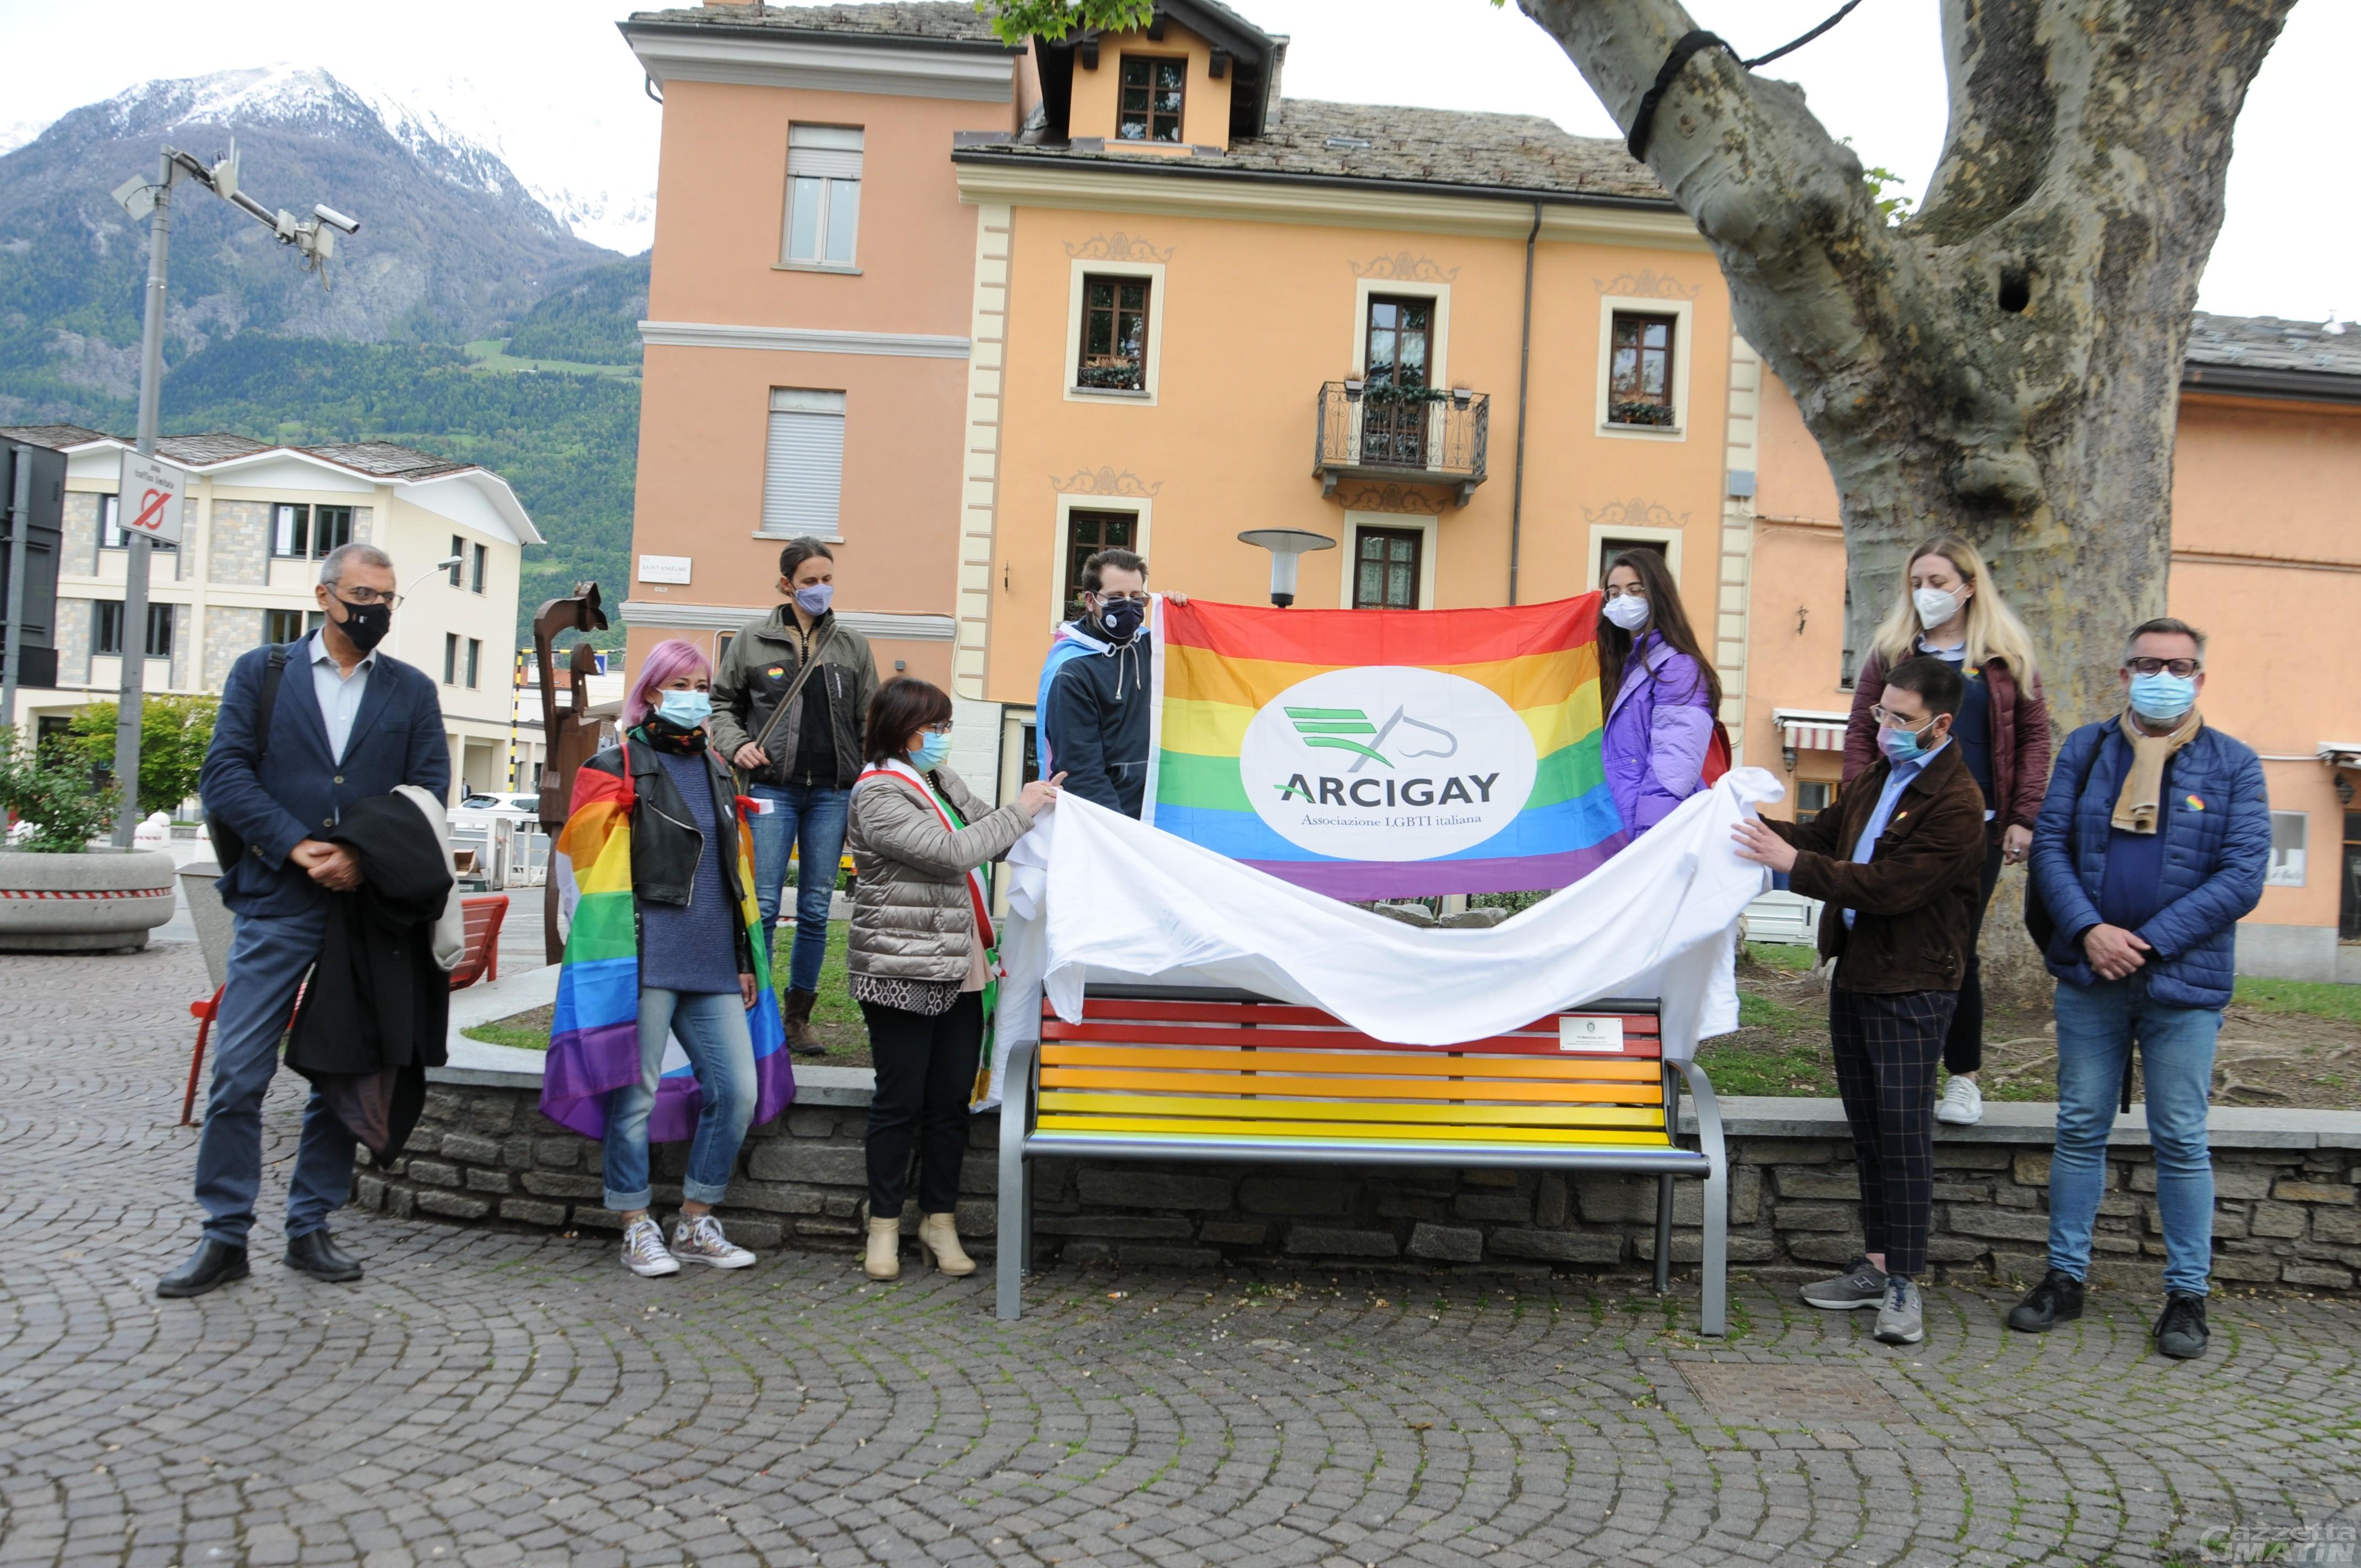 Lotta contro l'omobitransfobia, Aosta ha la sua panchina arcobaleno